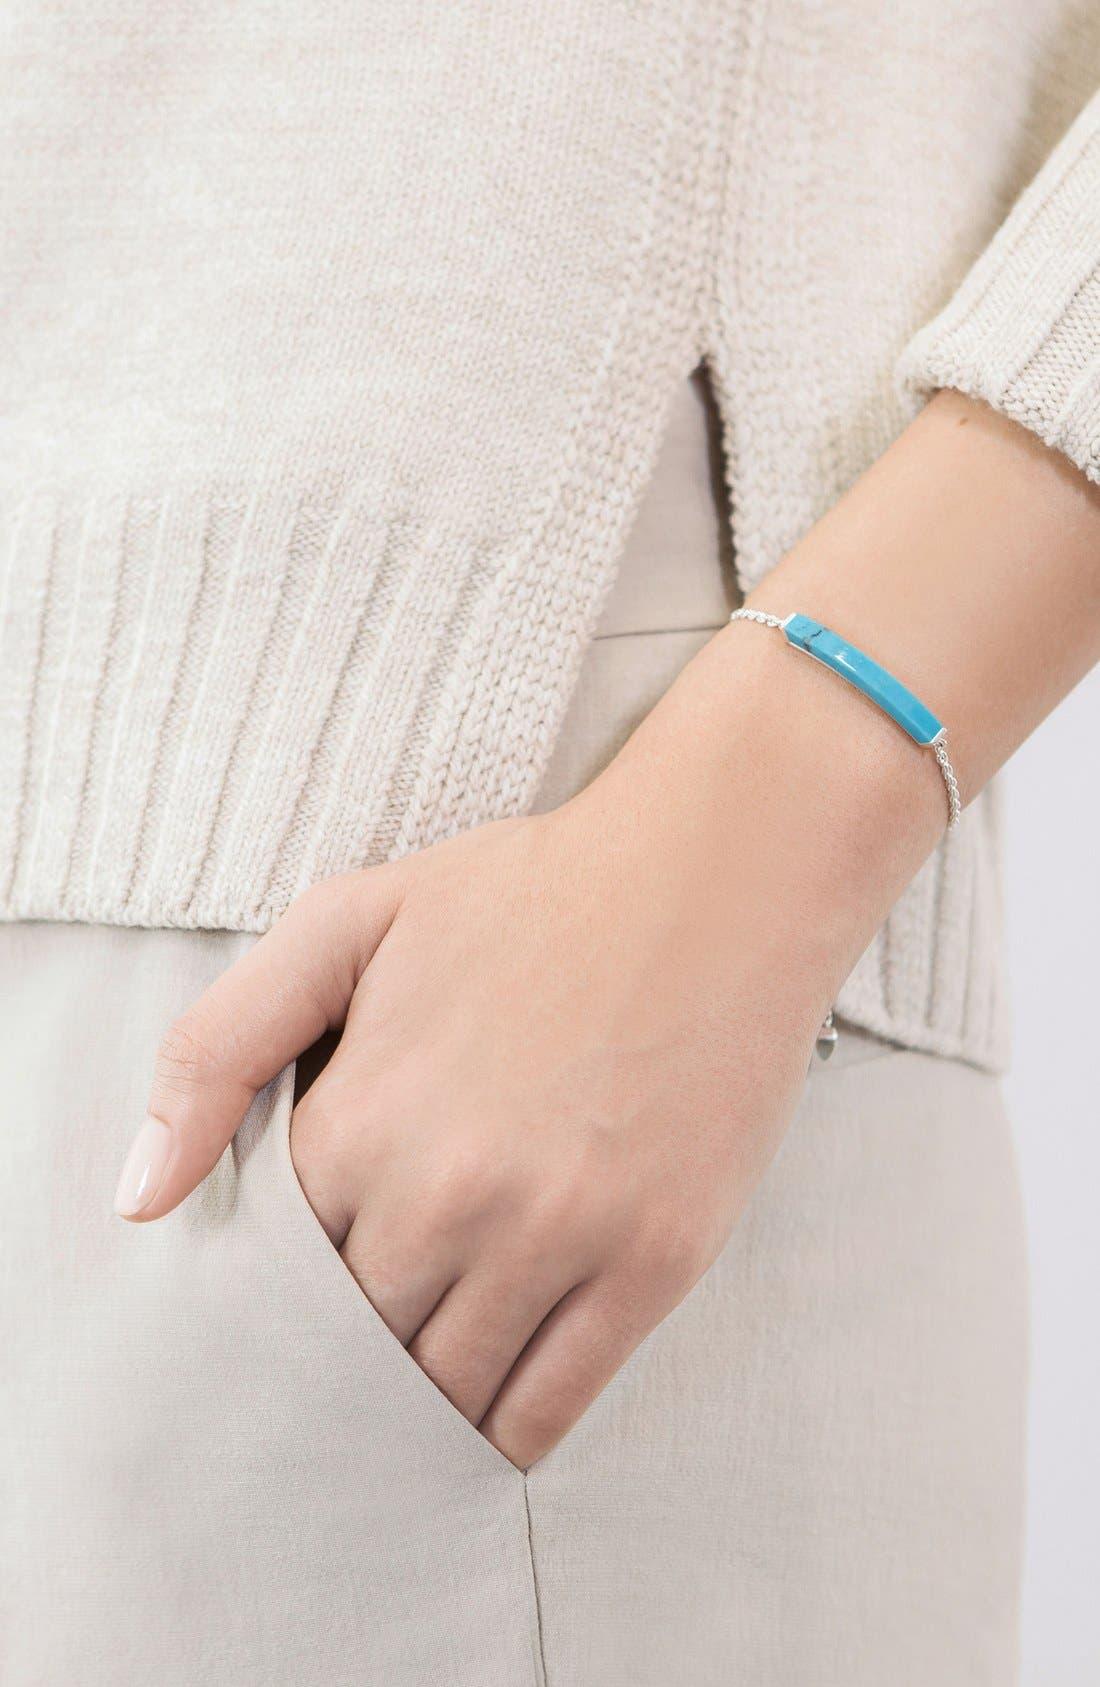 Engravable Linear Semiprecious Stone Friendship Bracelet,                             Alternate thumbnail 3, color,                             SILVER/ TURQUOISE